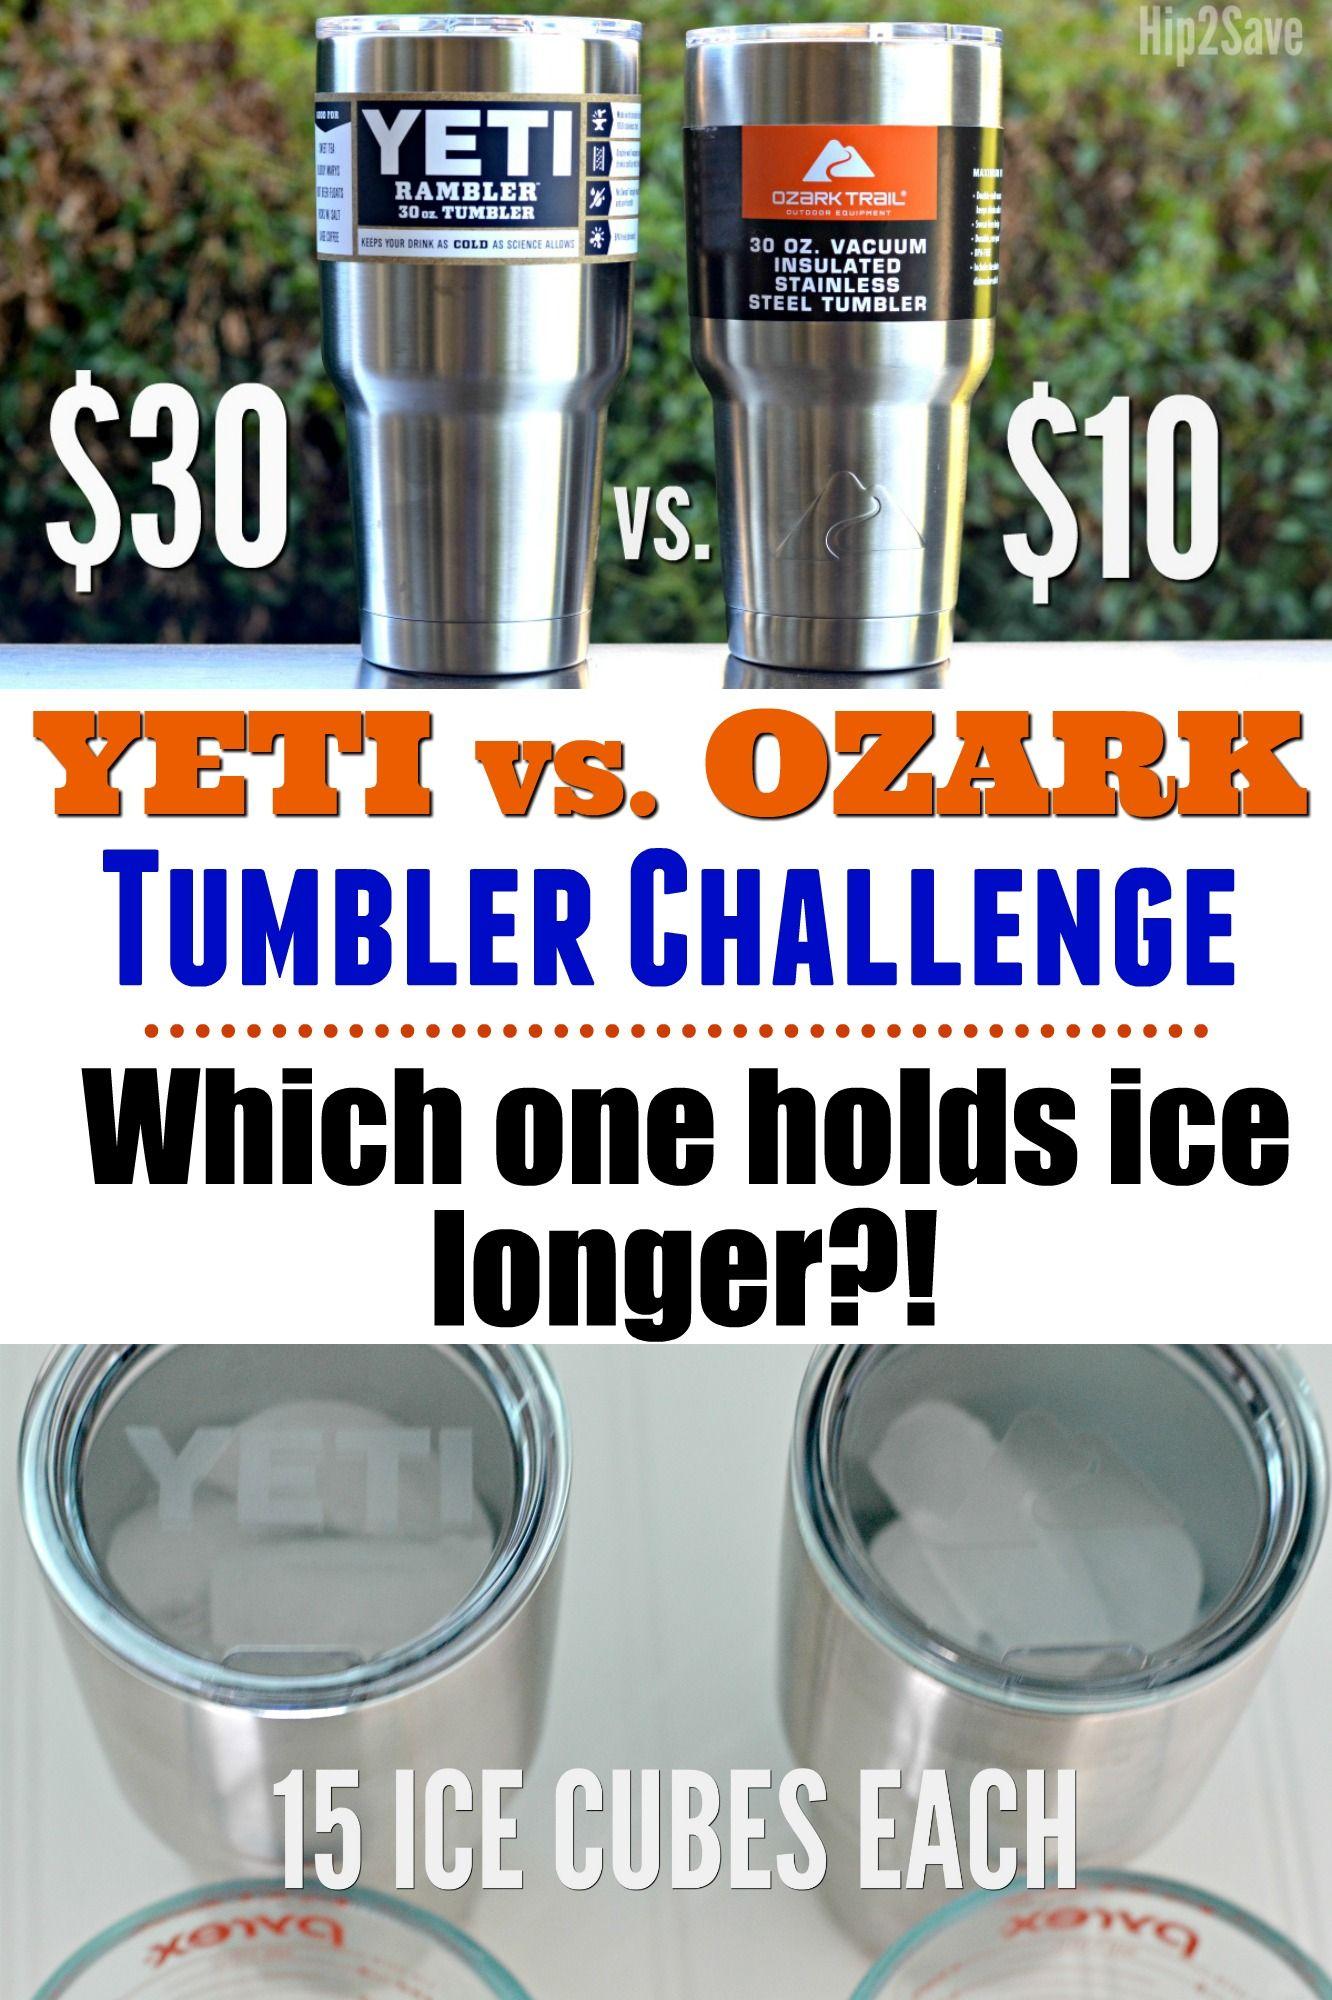 Yeti Vs. Ozark Tumbler Challenge Cool science fair